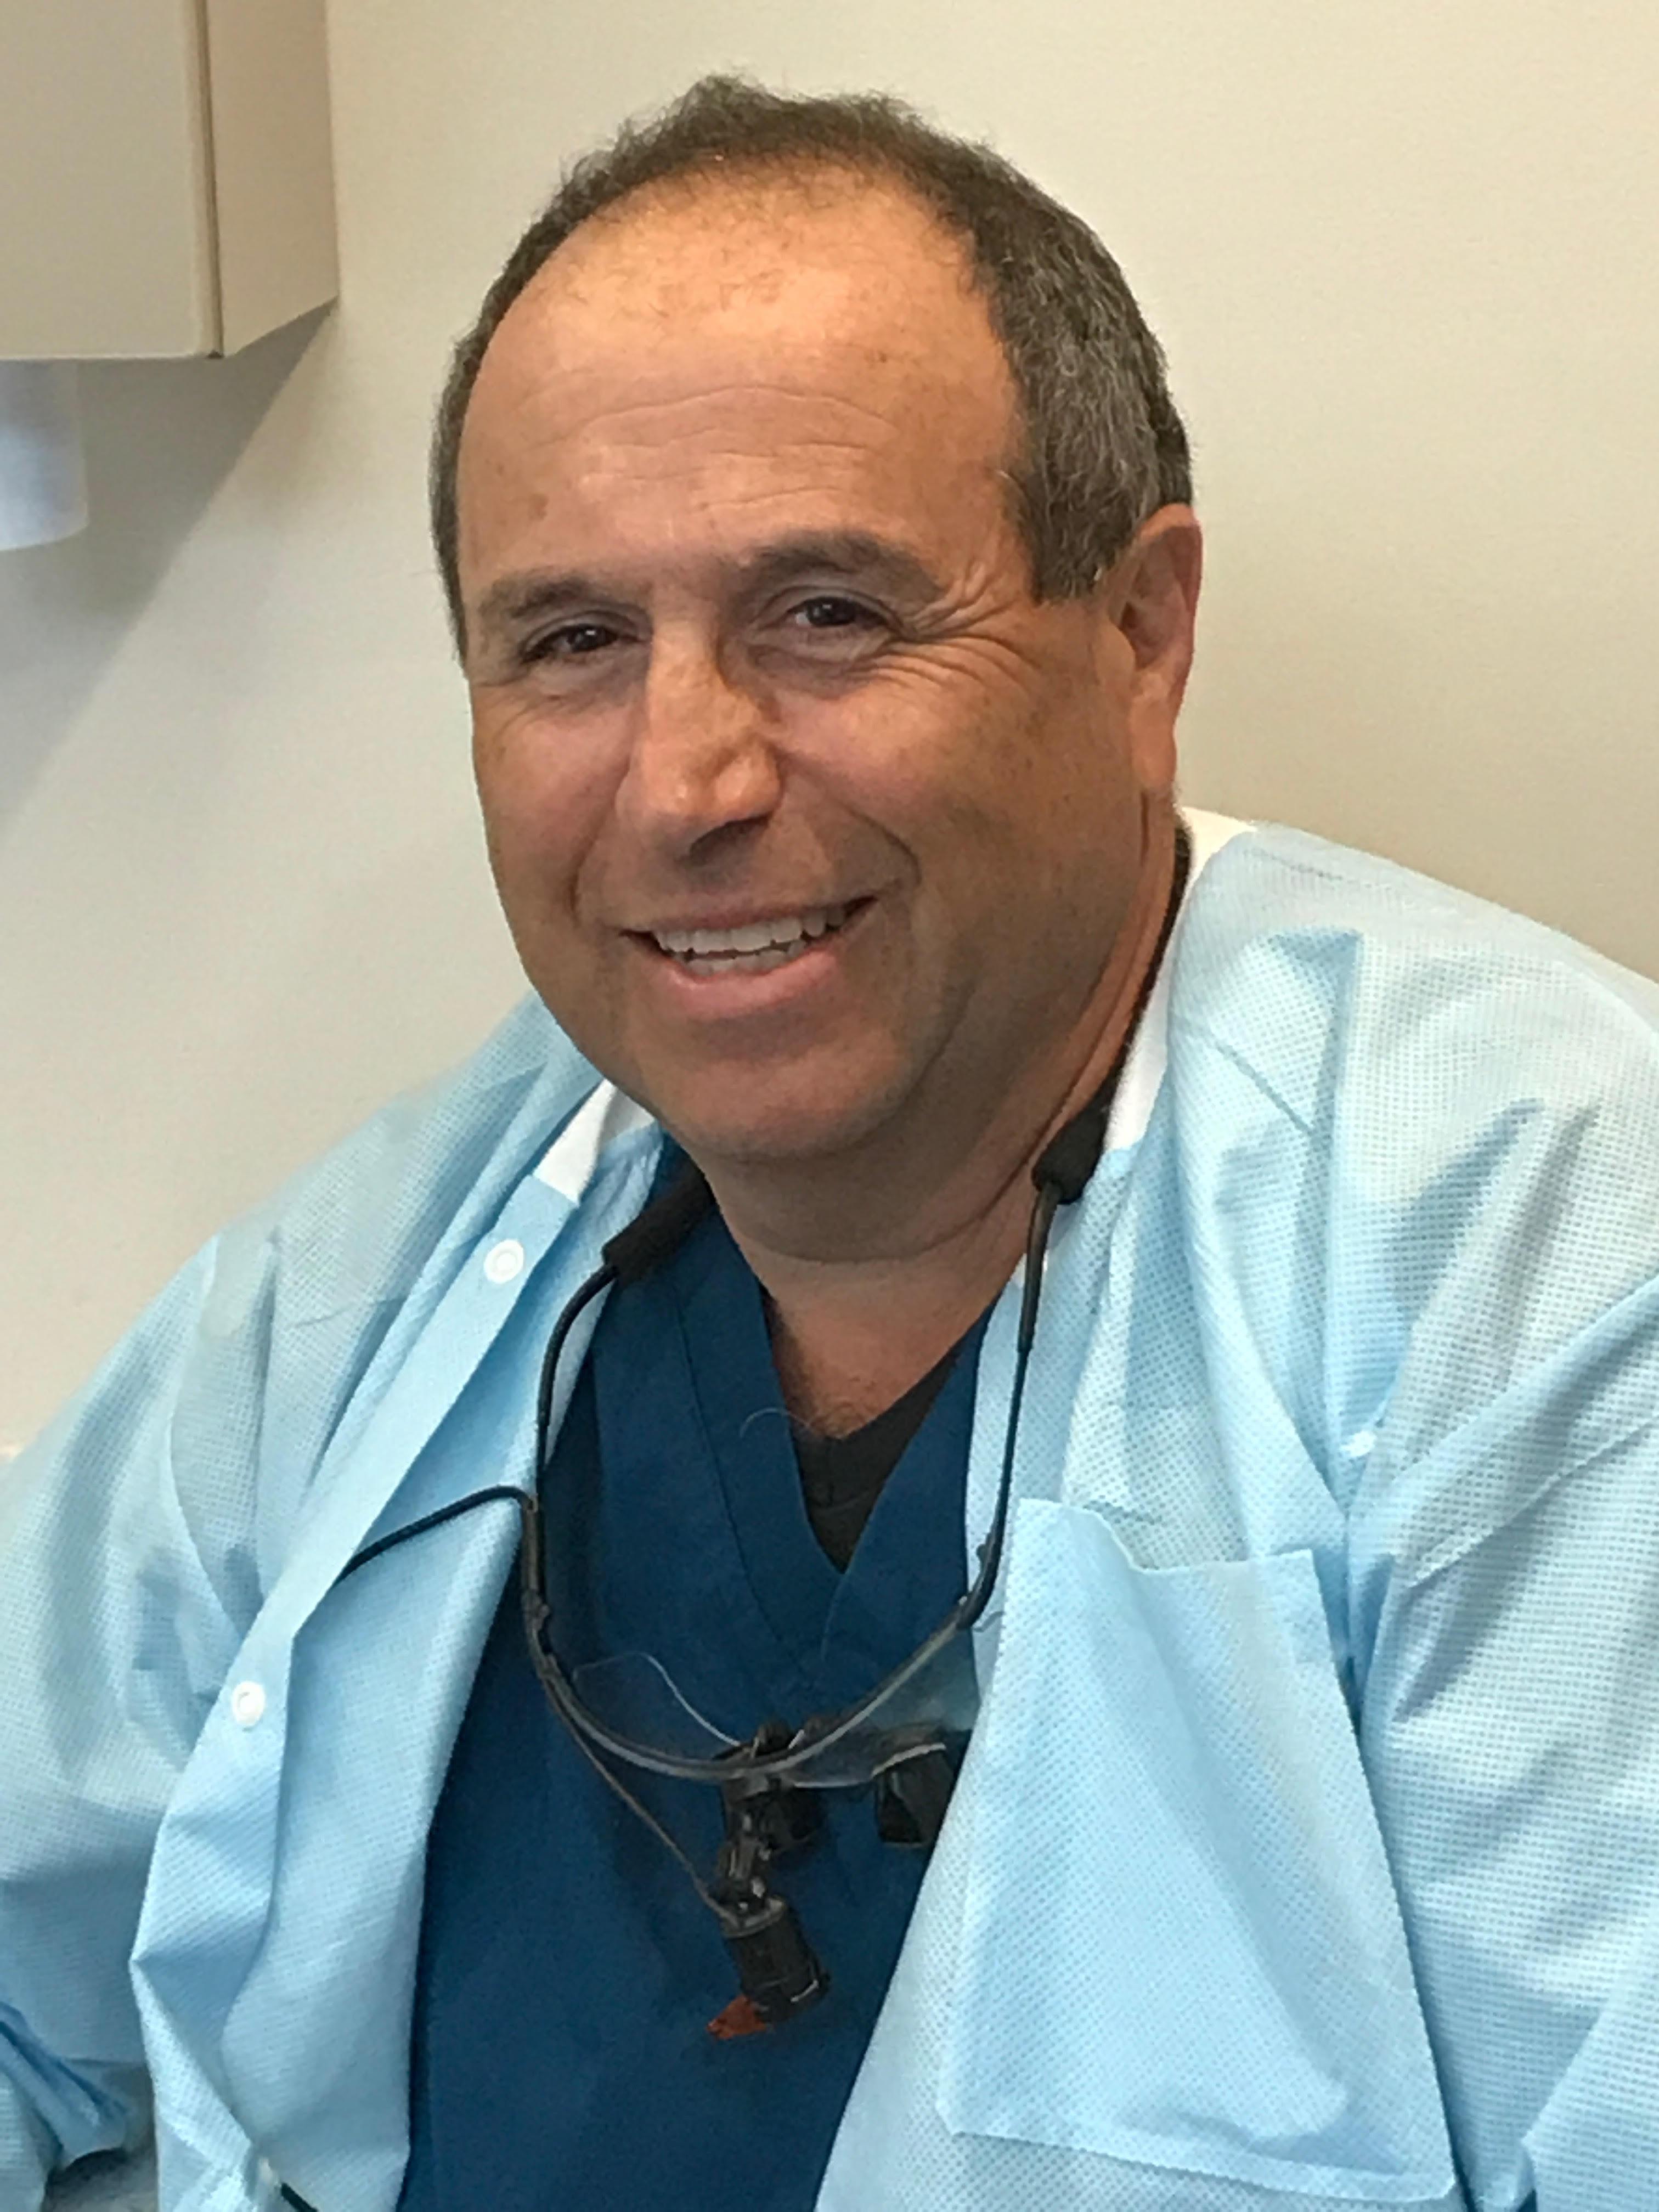 Dr Samuel Domski DMD